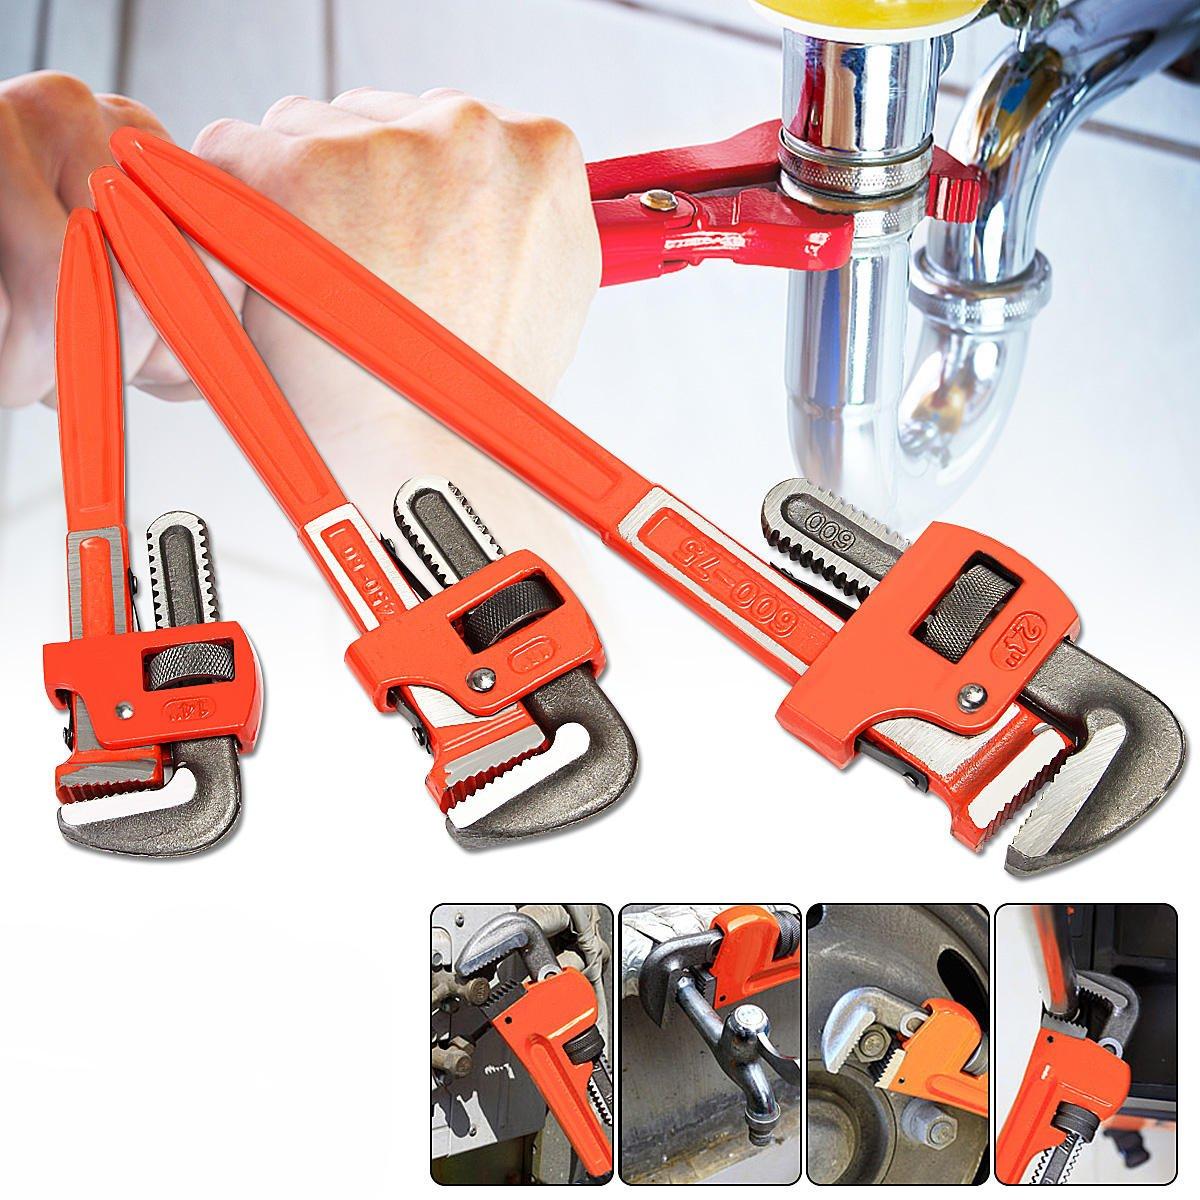 3 Pcs Heavy Duty Pipe Wrench Adjustable Set 14inch 18inch 24inch Monkey Soft Grip